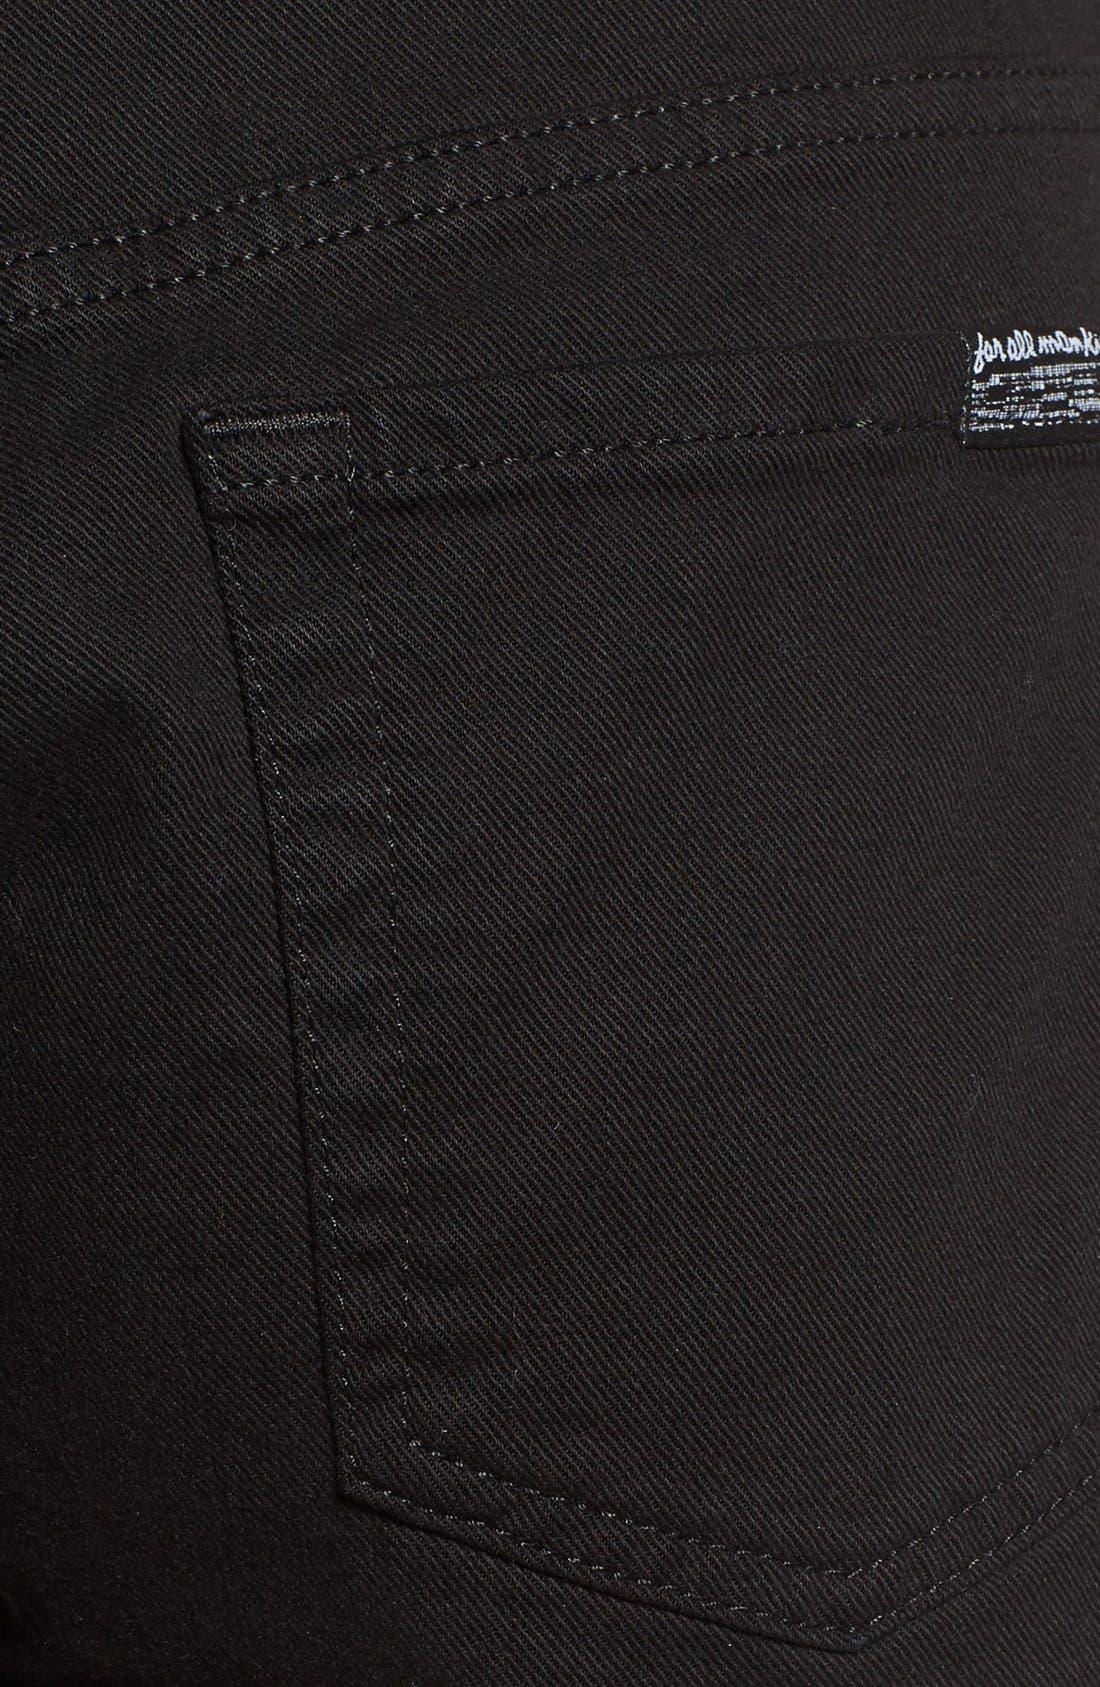 Cutoff Shorts,                             Alternate thumbnail 6, color,                             BLACK